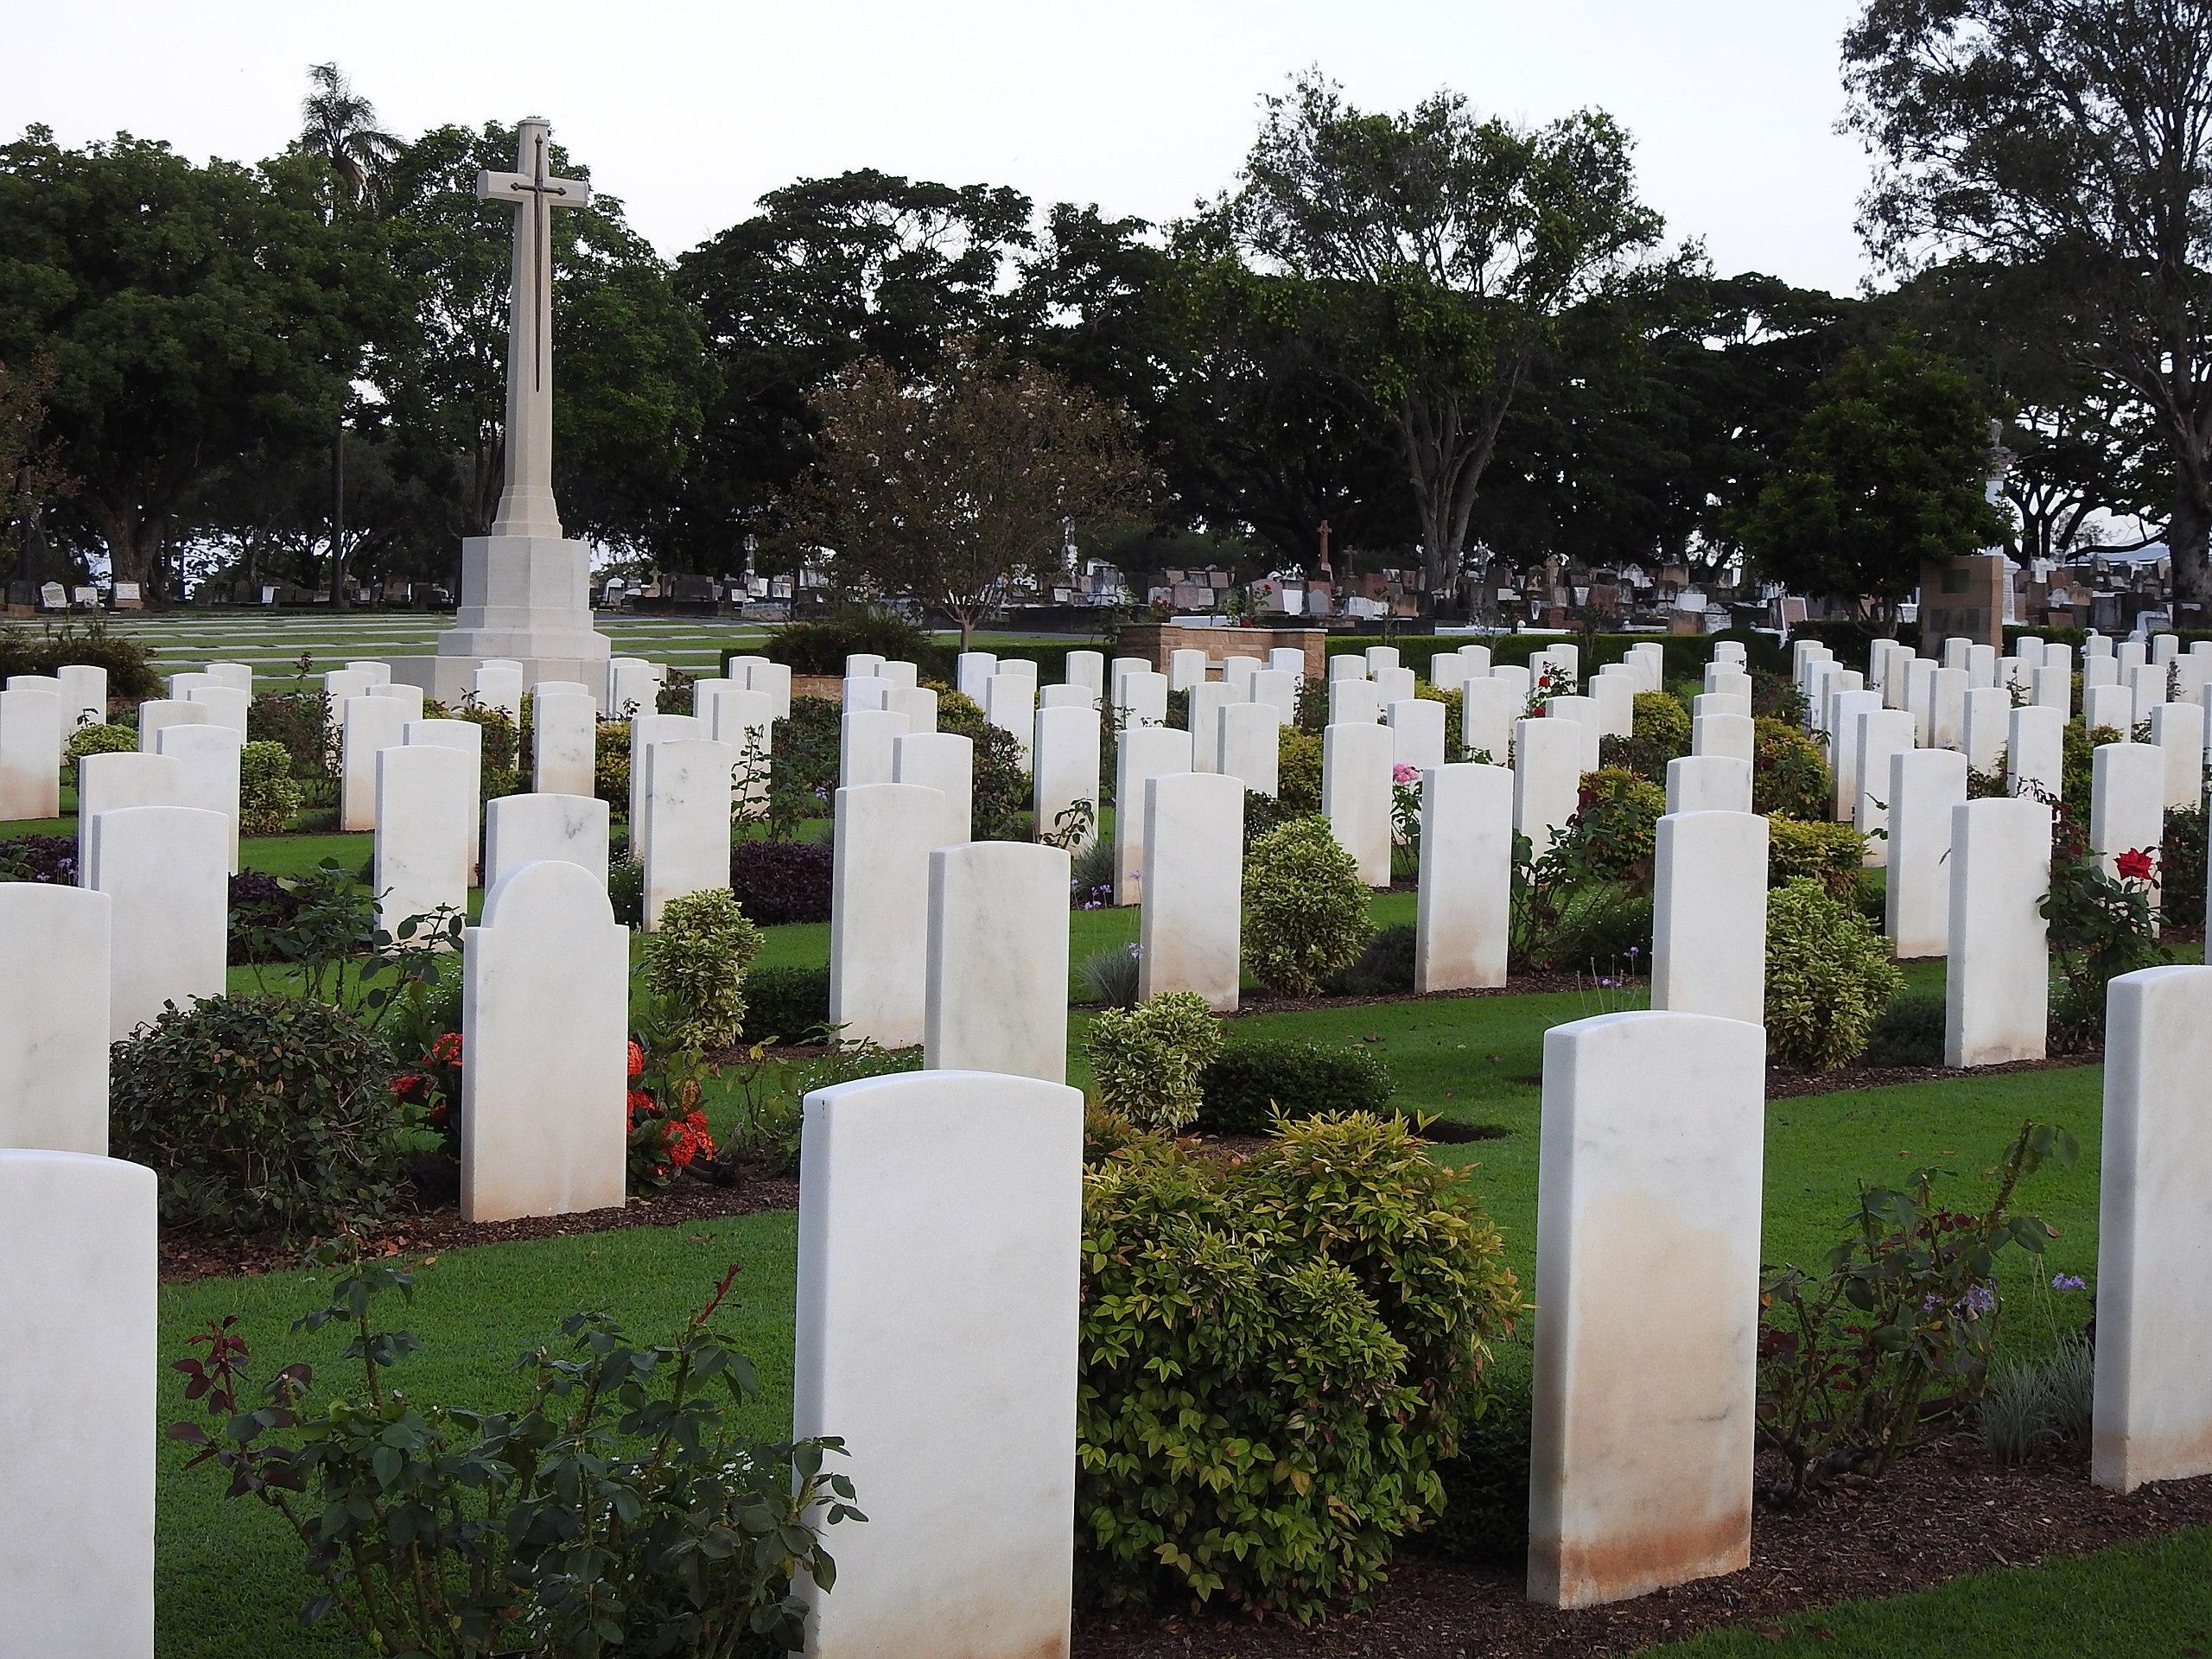 File:AU-Qld-Kedron-Lutwyche-Cemetery-war graves-2021.jpg - Wikipedia